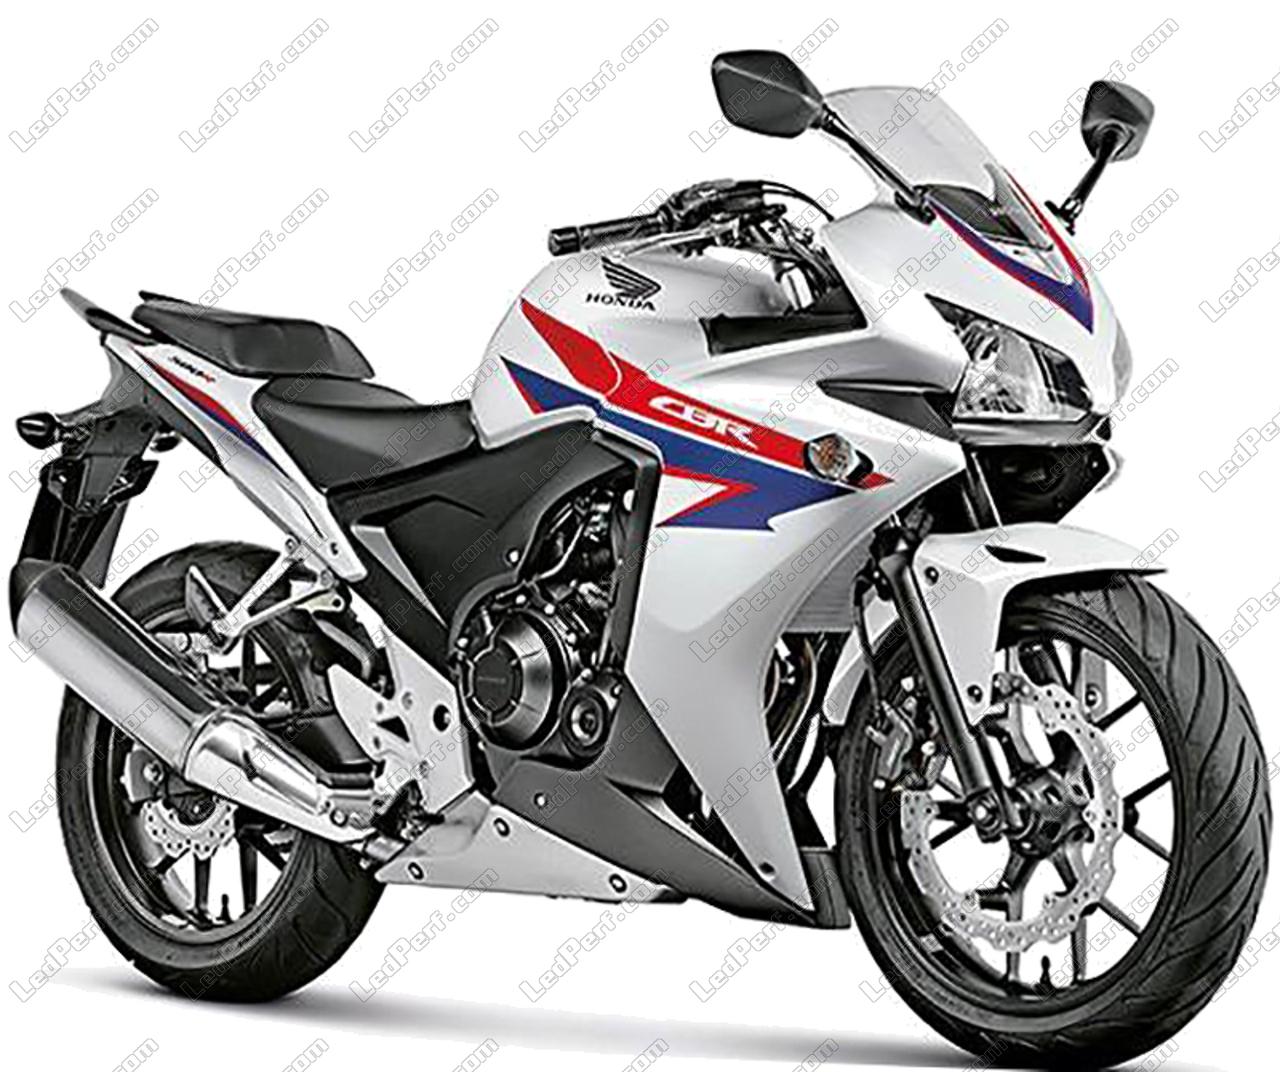 Honda CBR 500 R 2013-2015 Phare avant de remplacement feu de moto